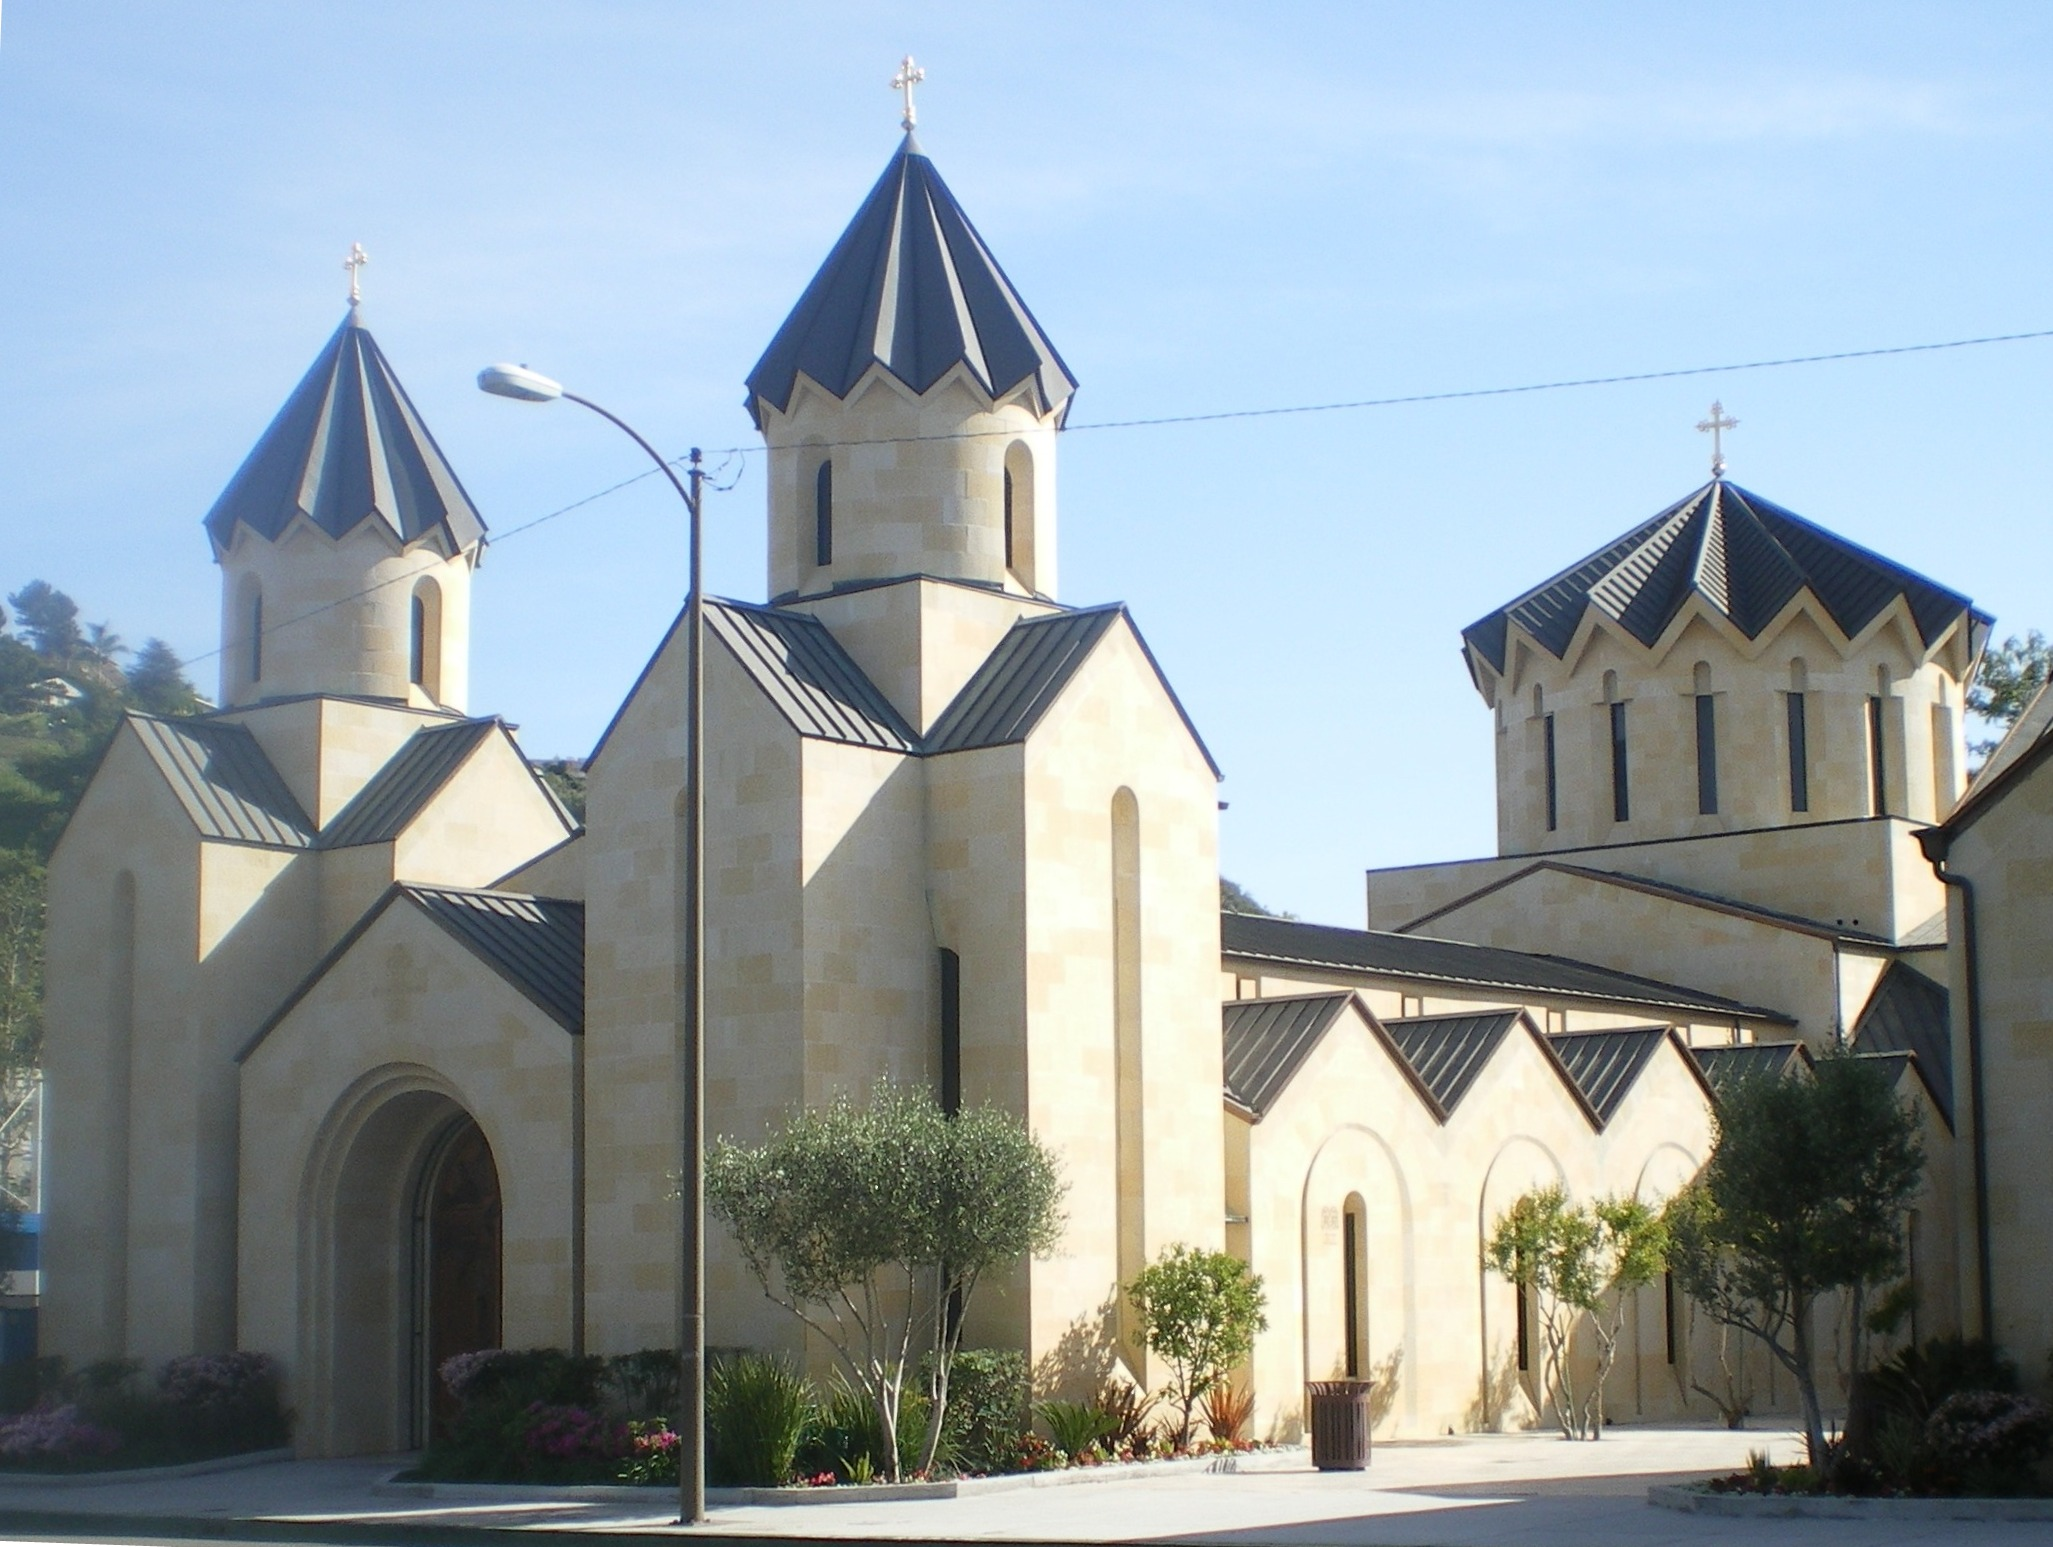 http://upload.wikimedia.org/wikipedia/commons/8/83/St._Gregory_Armenian_Catholic_Church,_Glendale,_California.JPG